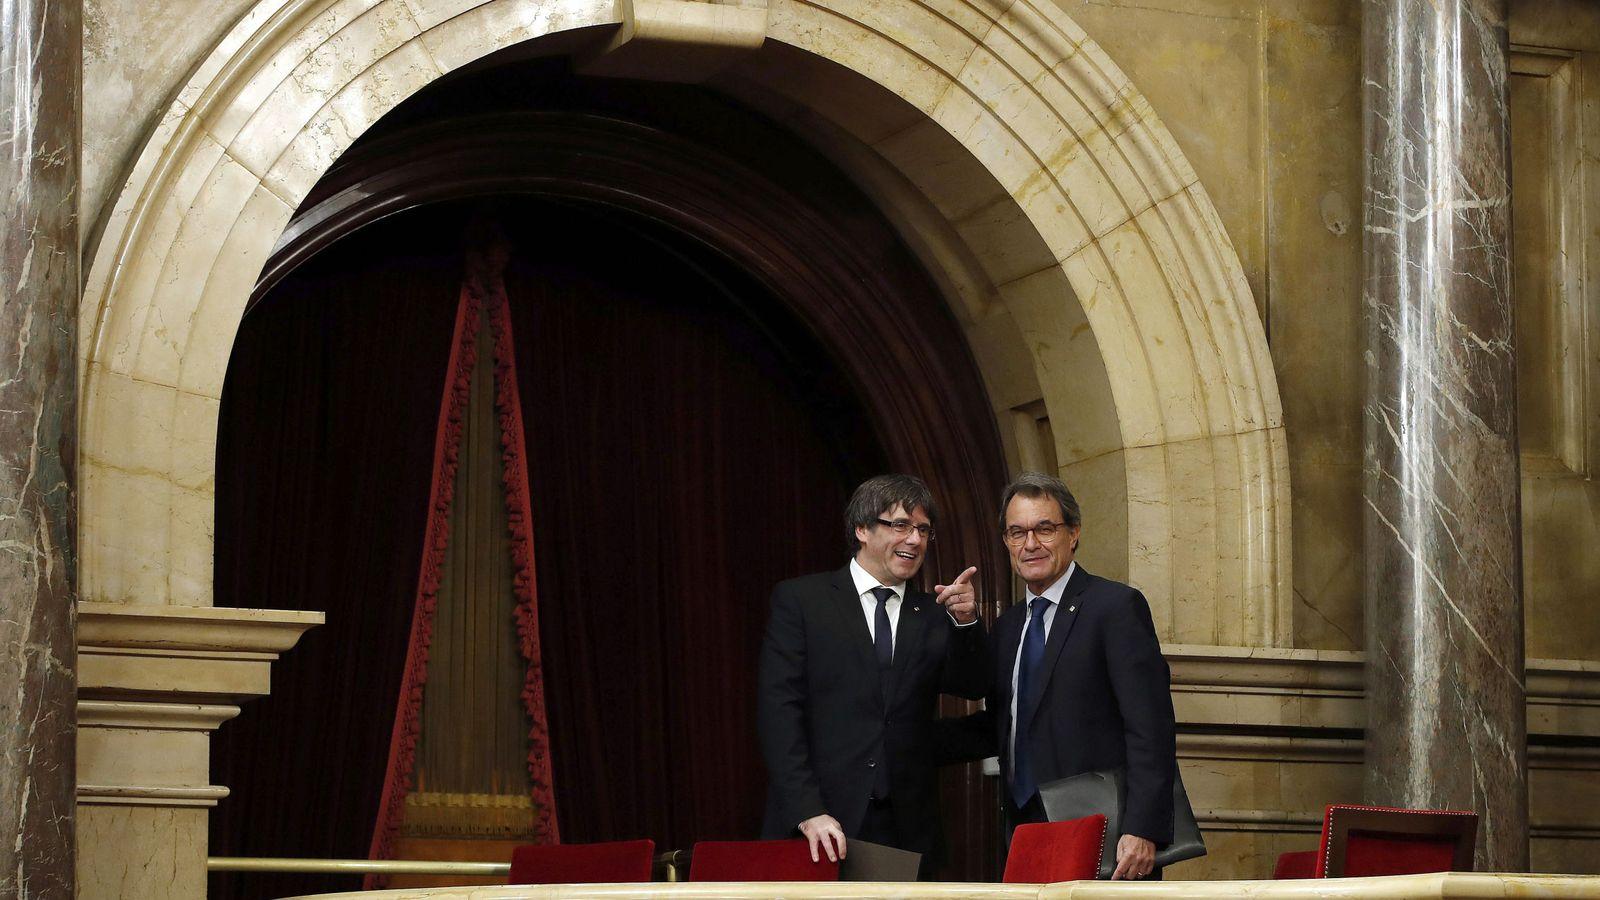 Foto: Los expresidentes de la Generalitat Carles Puigdemont (i) y Artur Mas (d) en la tribuna de invitados del hemiciclo del Parlament. (EFE)